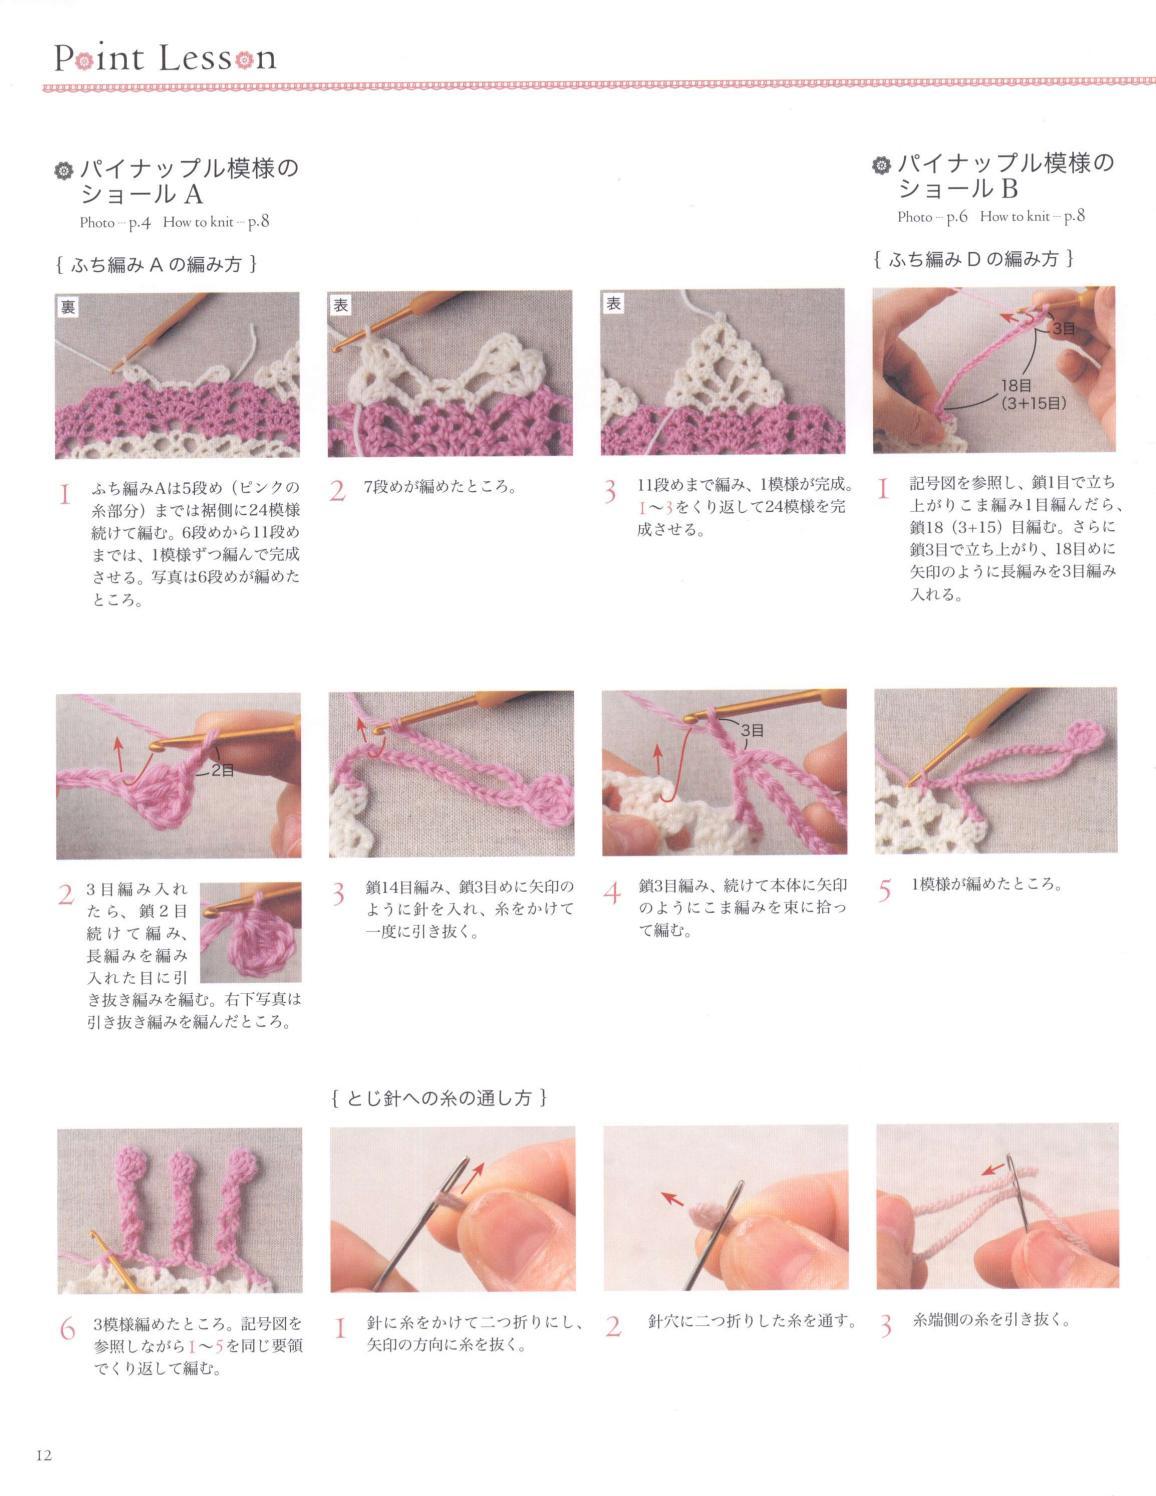 Asahi original crochet best selection 2012 page 12